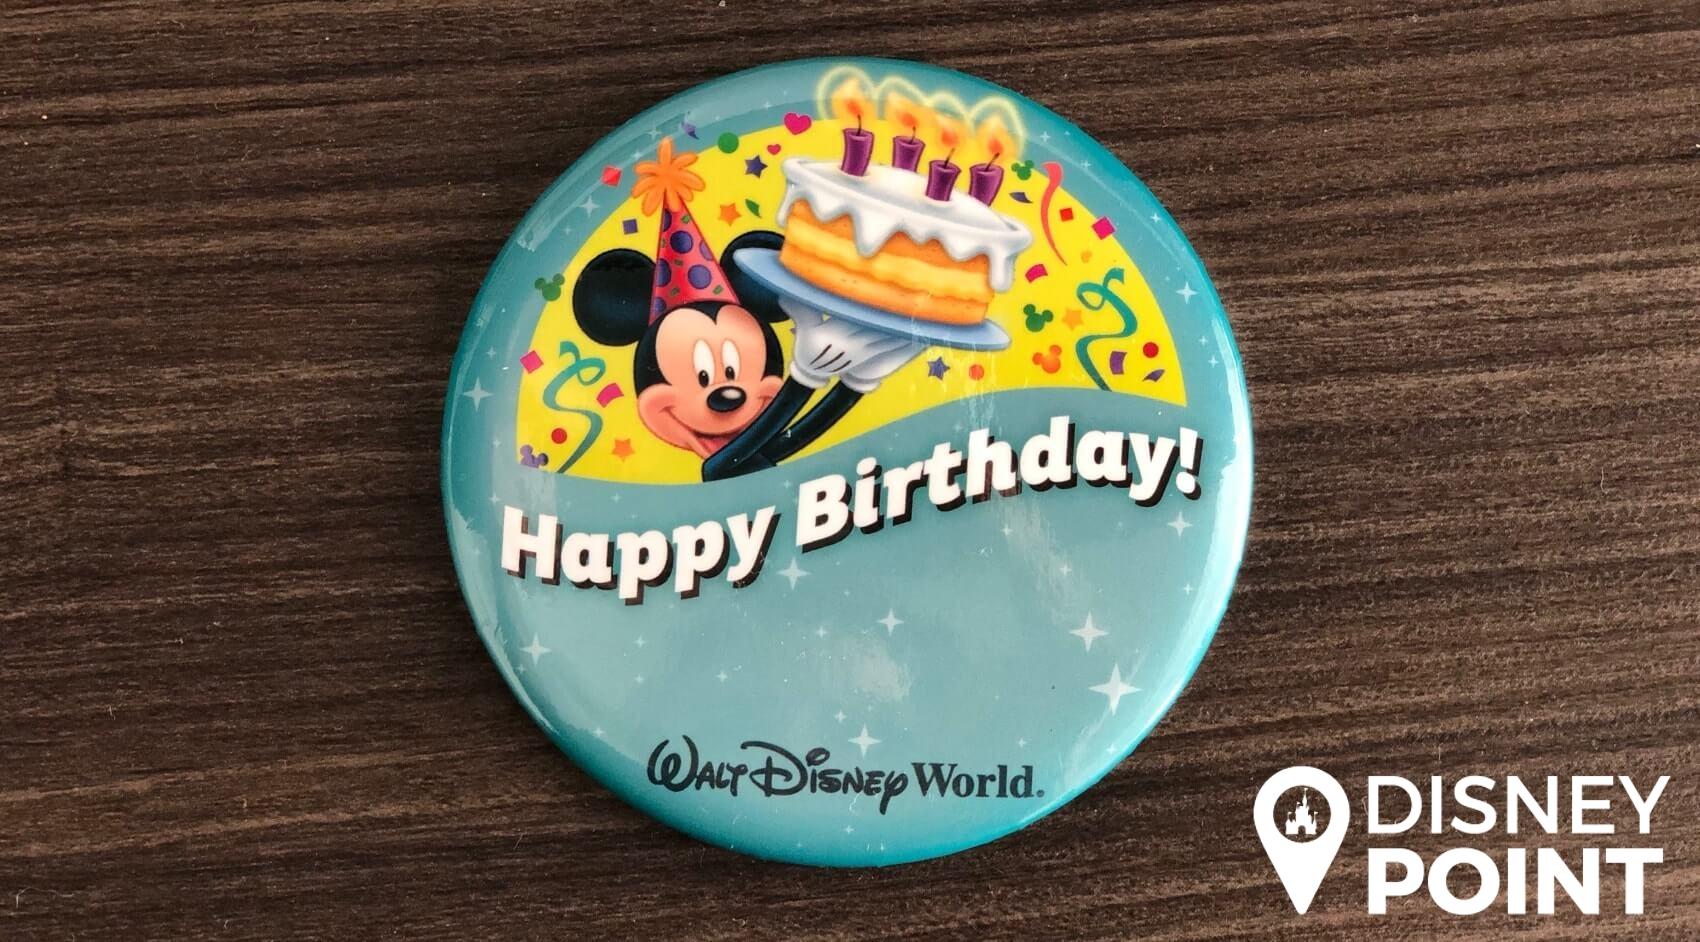 Disney Point Button Grátis Disney Aniversario-min